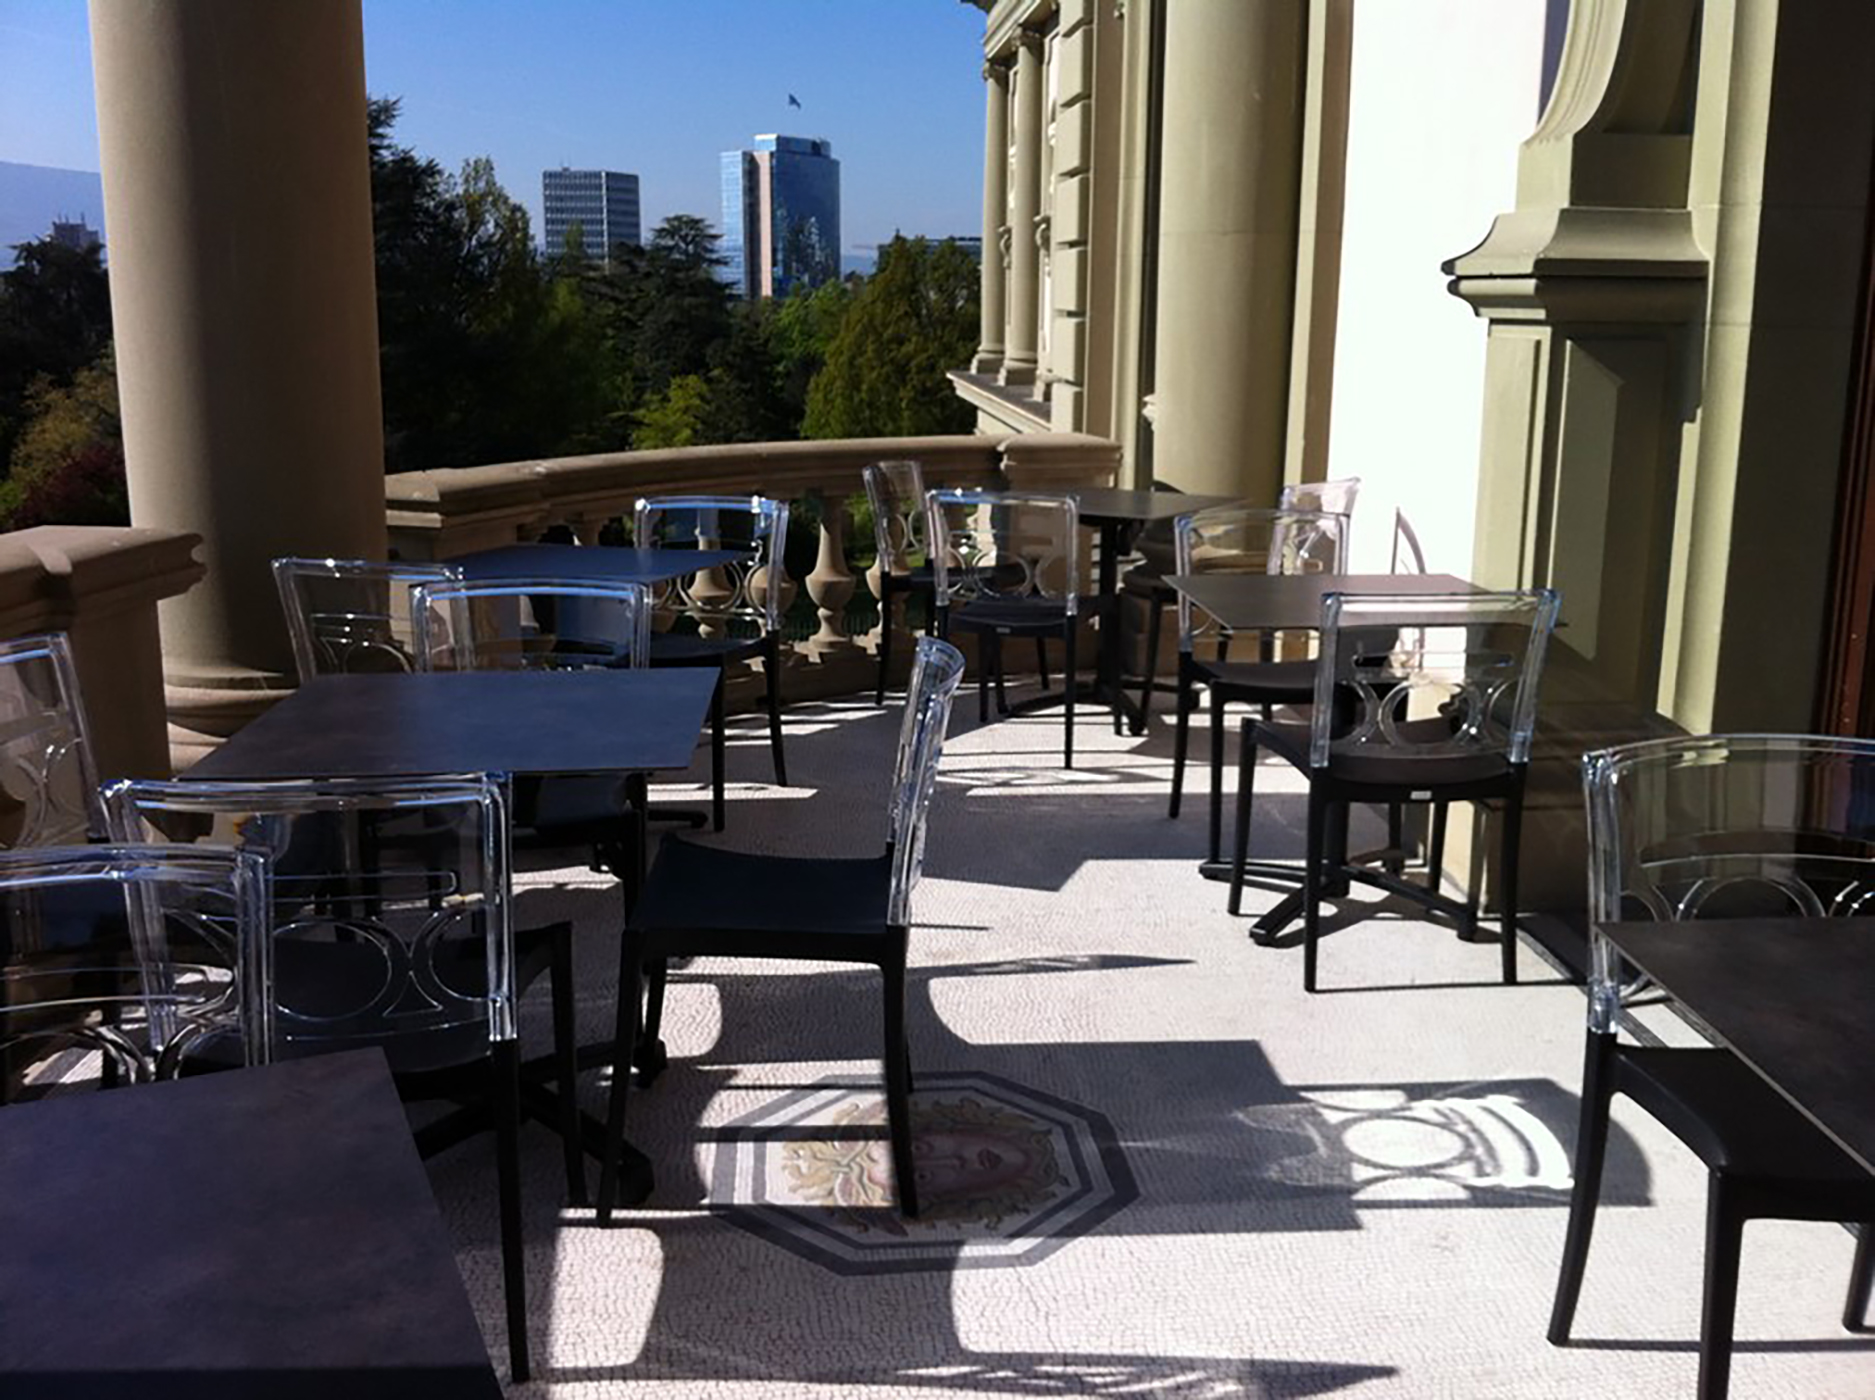 Musée Ariana - Terrasse du Comptoir Gourmand